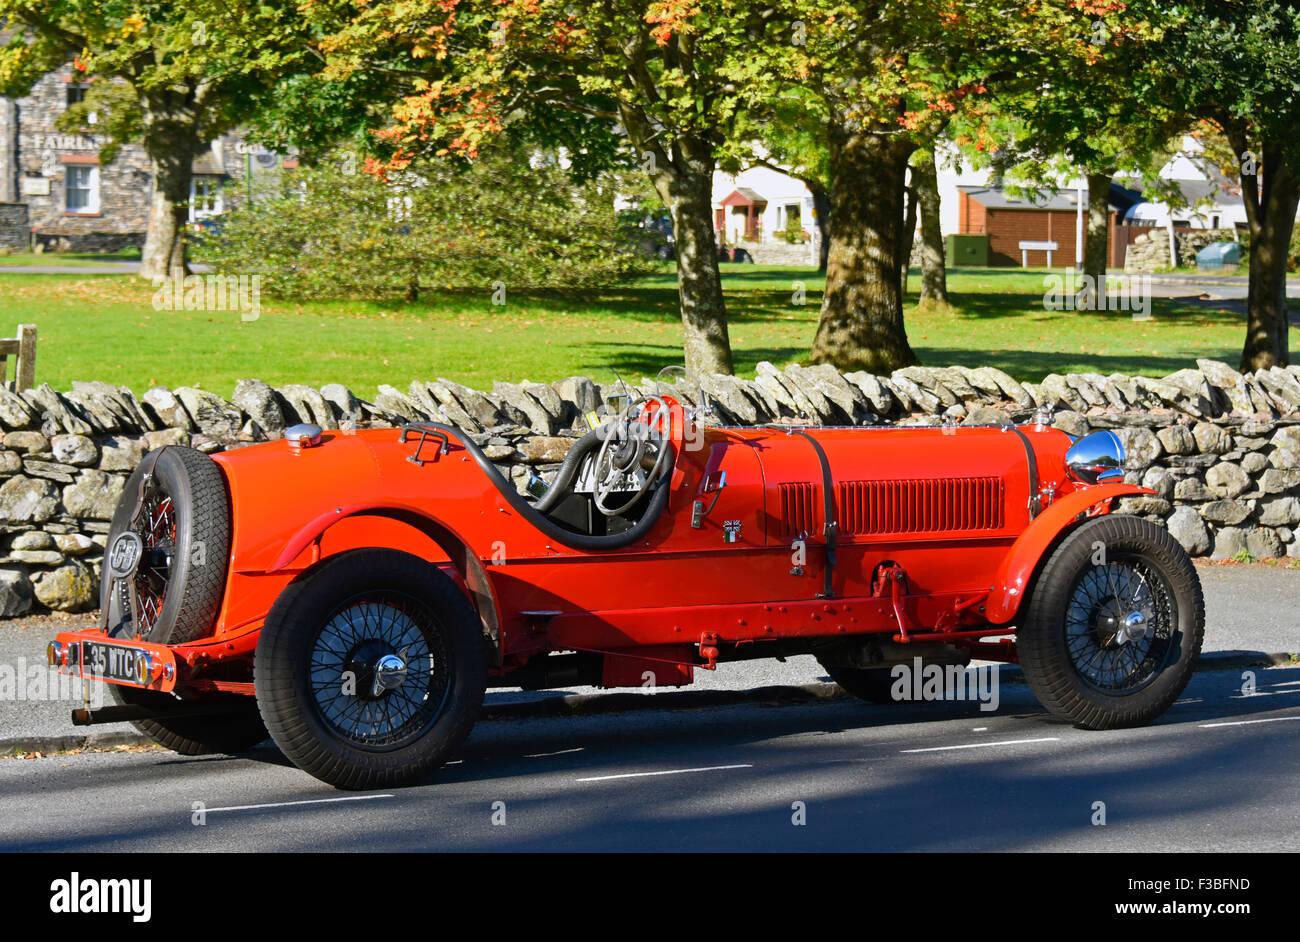 Singer Motors sports car. - Stock Image